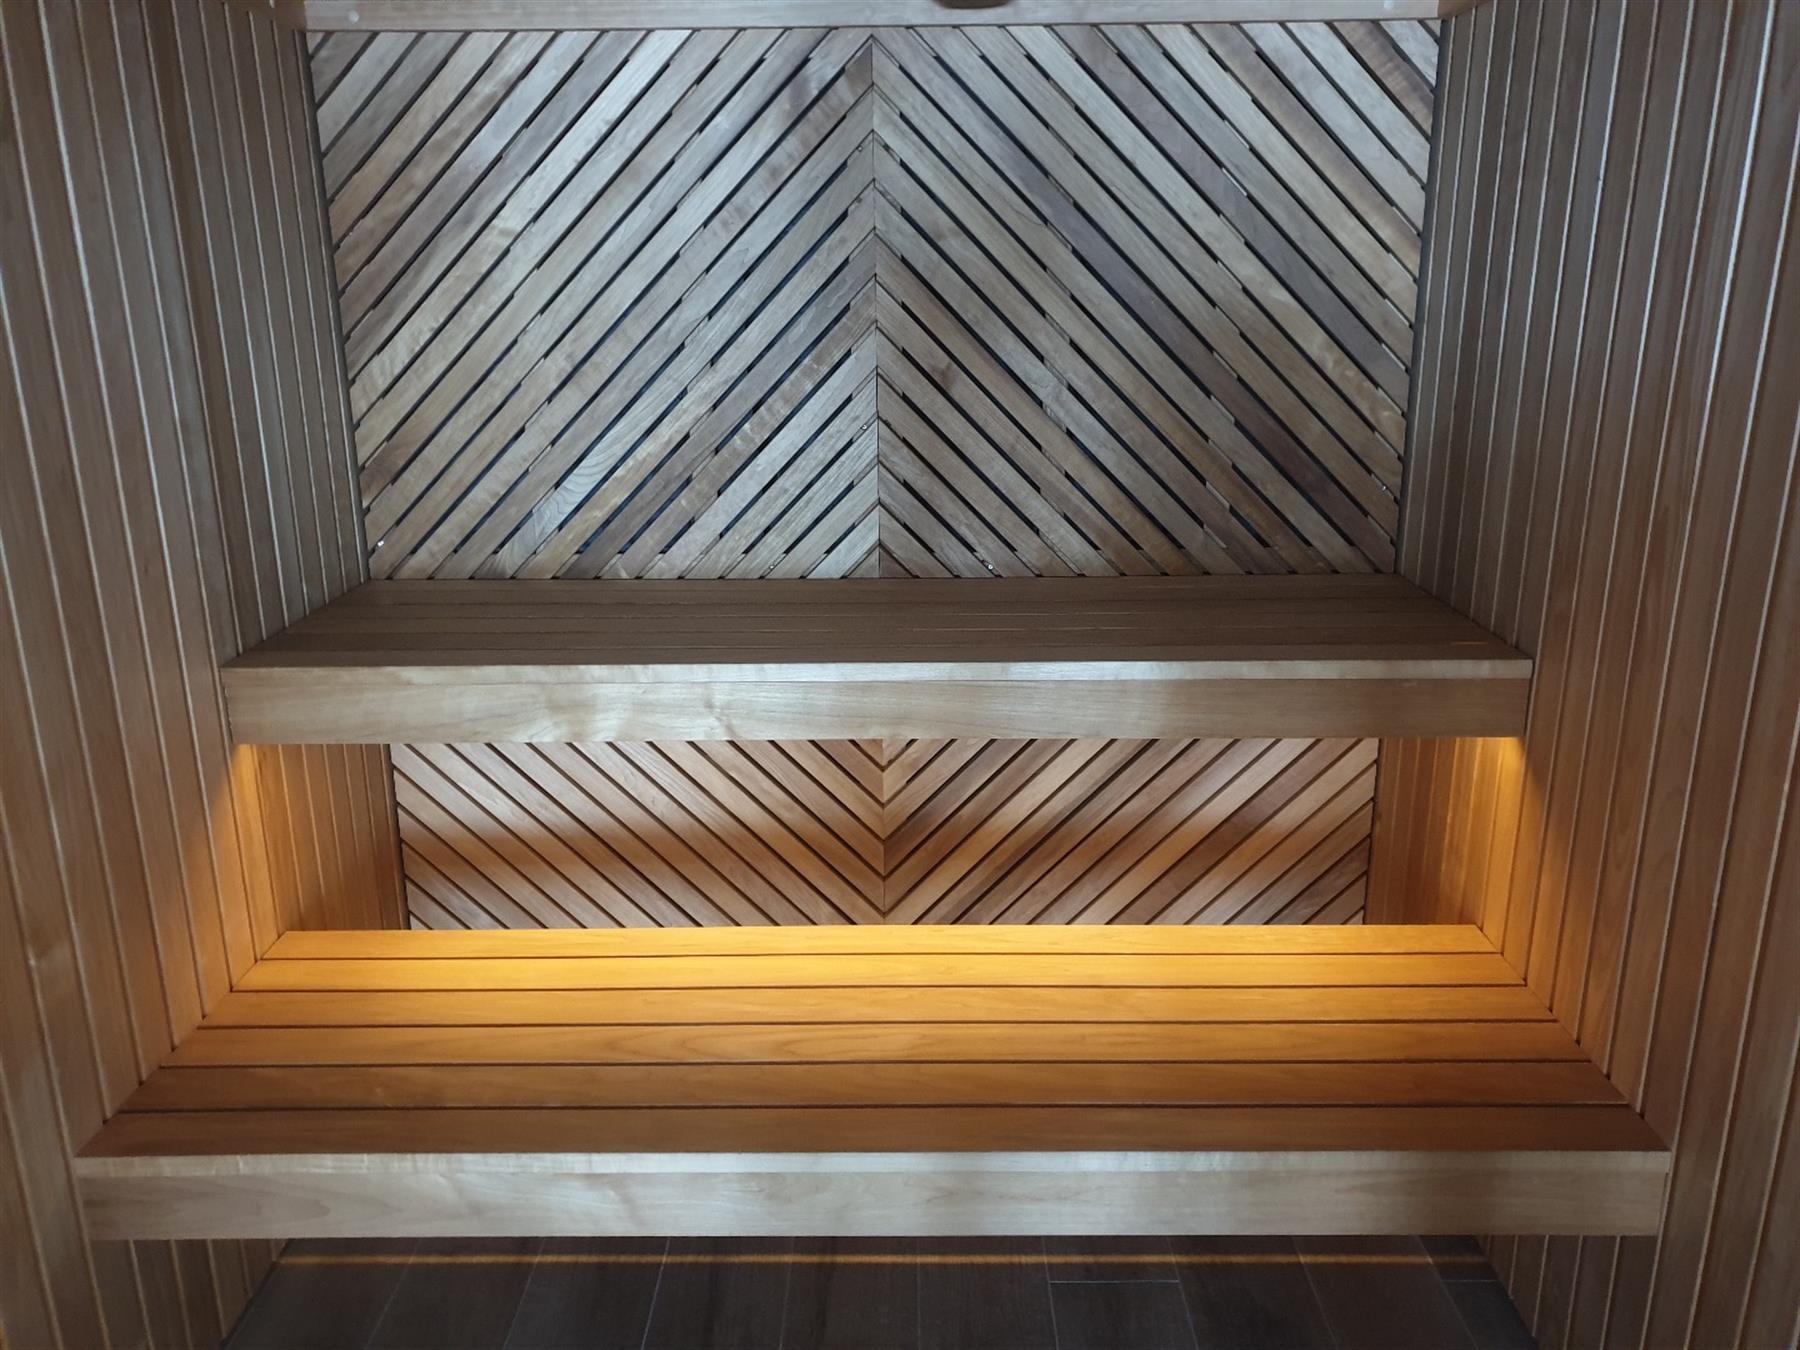 Badstue med varmebehandlet skrå panel